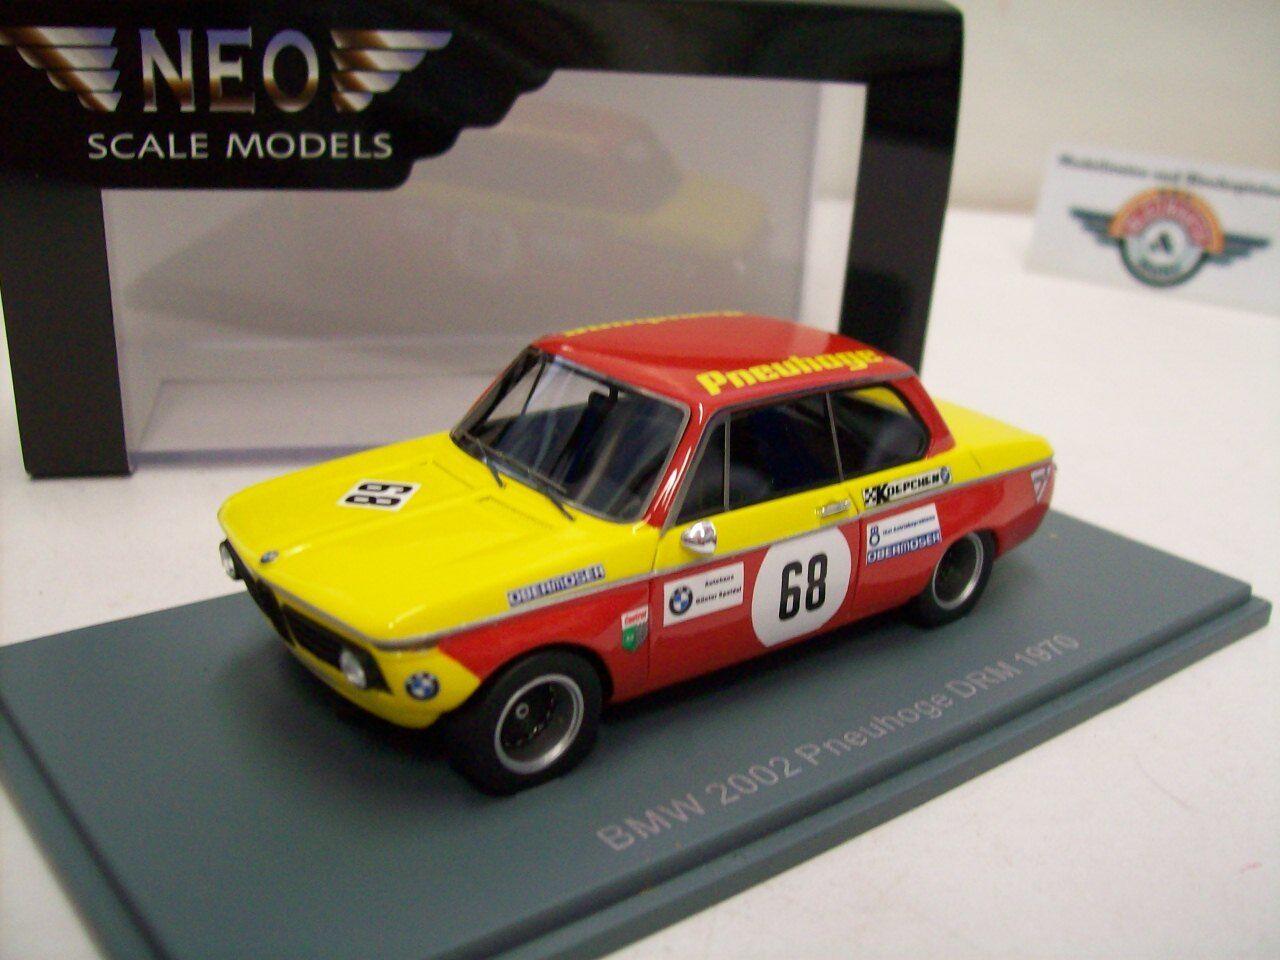 BMW 2002  Pneuhoge  DRM 1970, Yellow Red, Neo 1 43, OVP